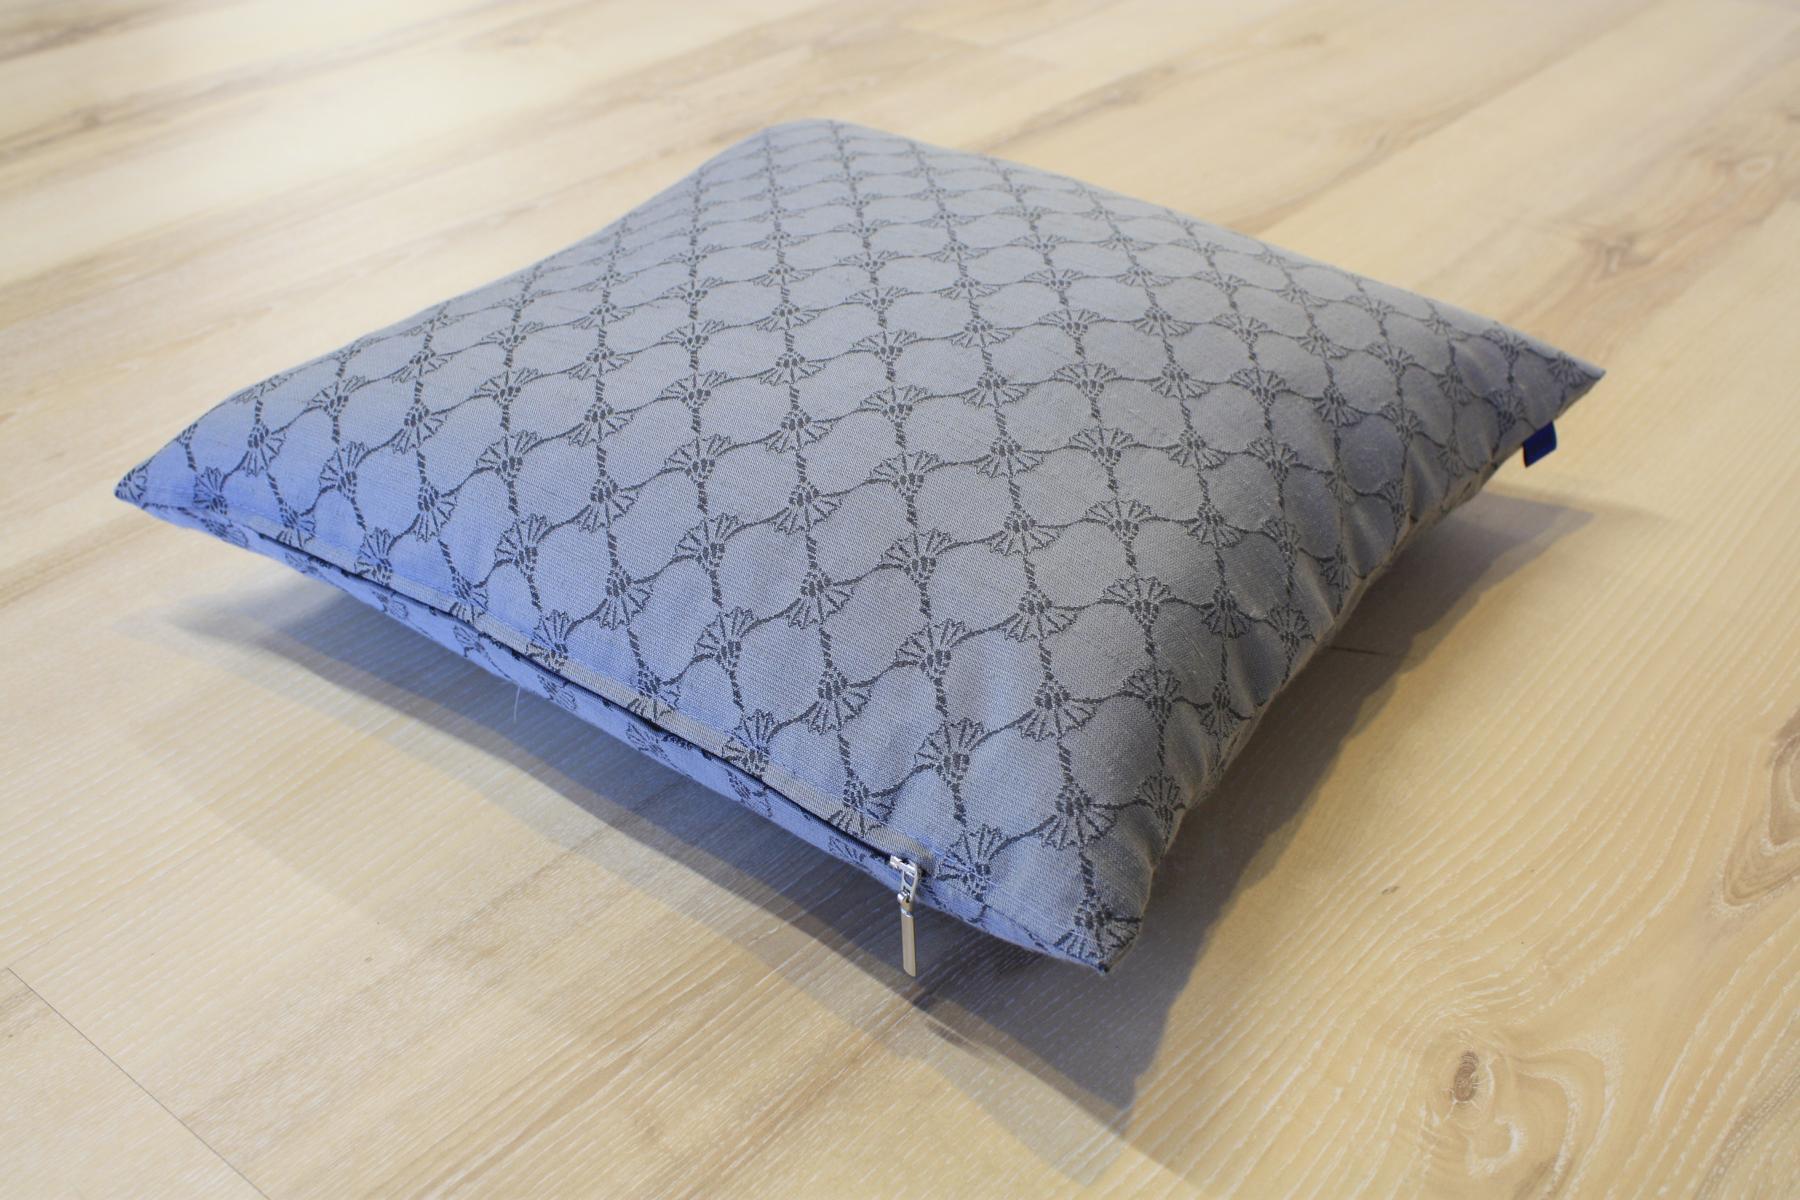 joop kissen cornflower 010 stein 40x40 cm inkl federf llung ebay. Black Bedroom Furniture Sets. Home Design Ideas